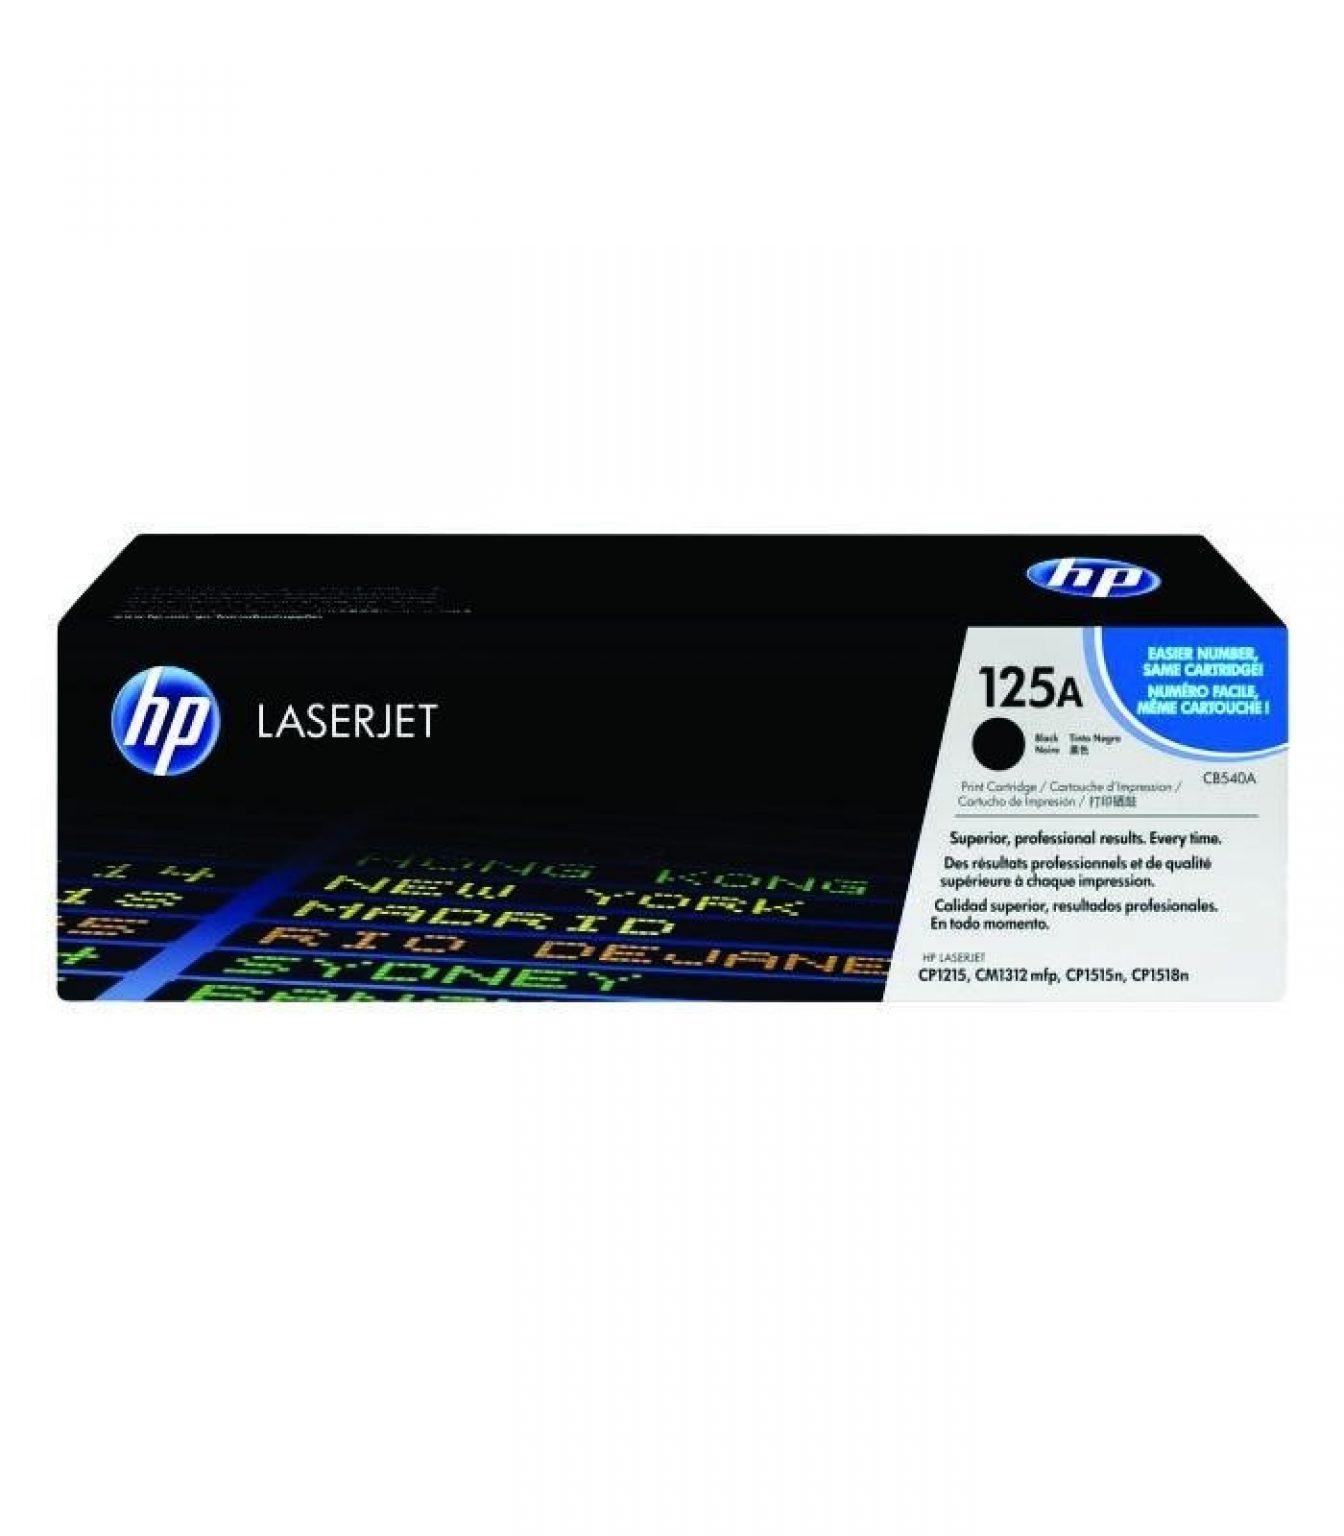 HP - Color LaserJet CP1215/1515 Black Cartridge [CB540A]